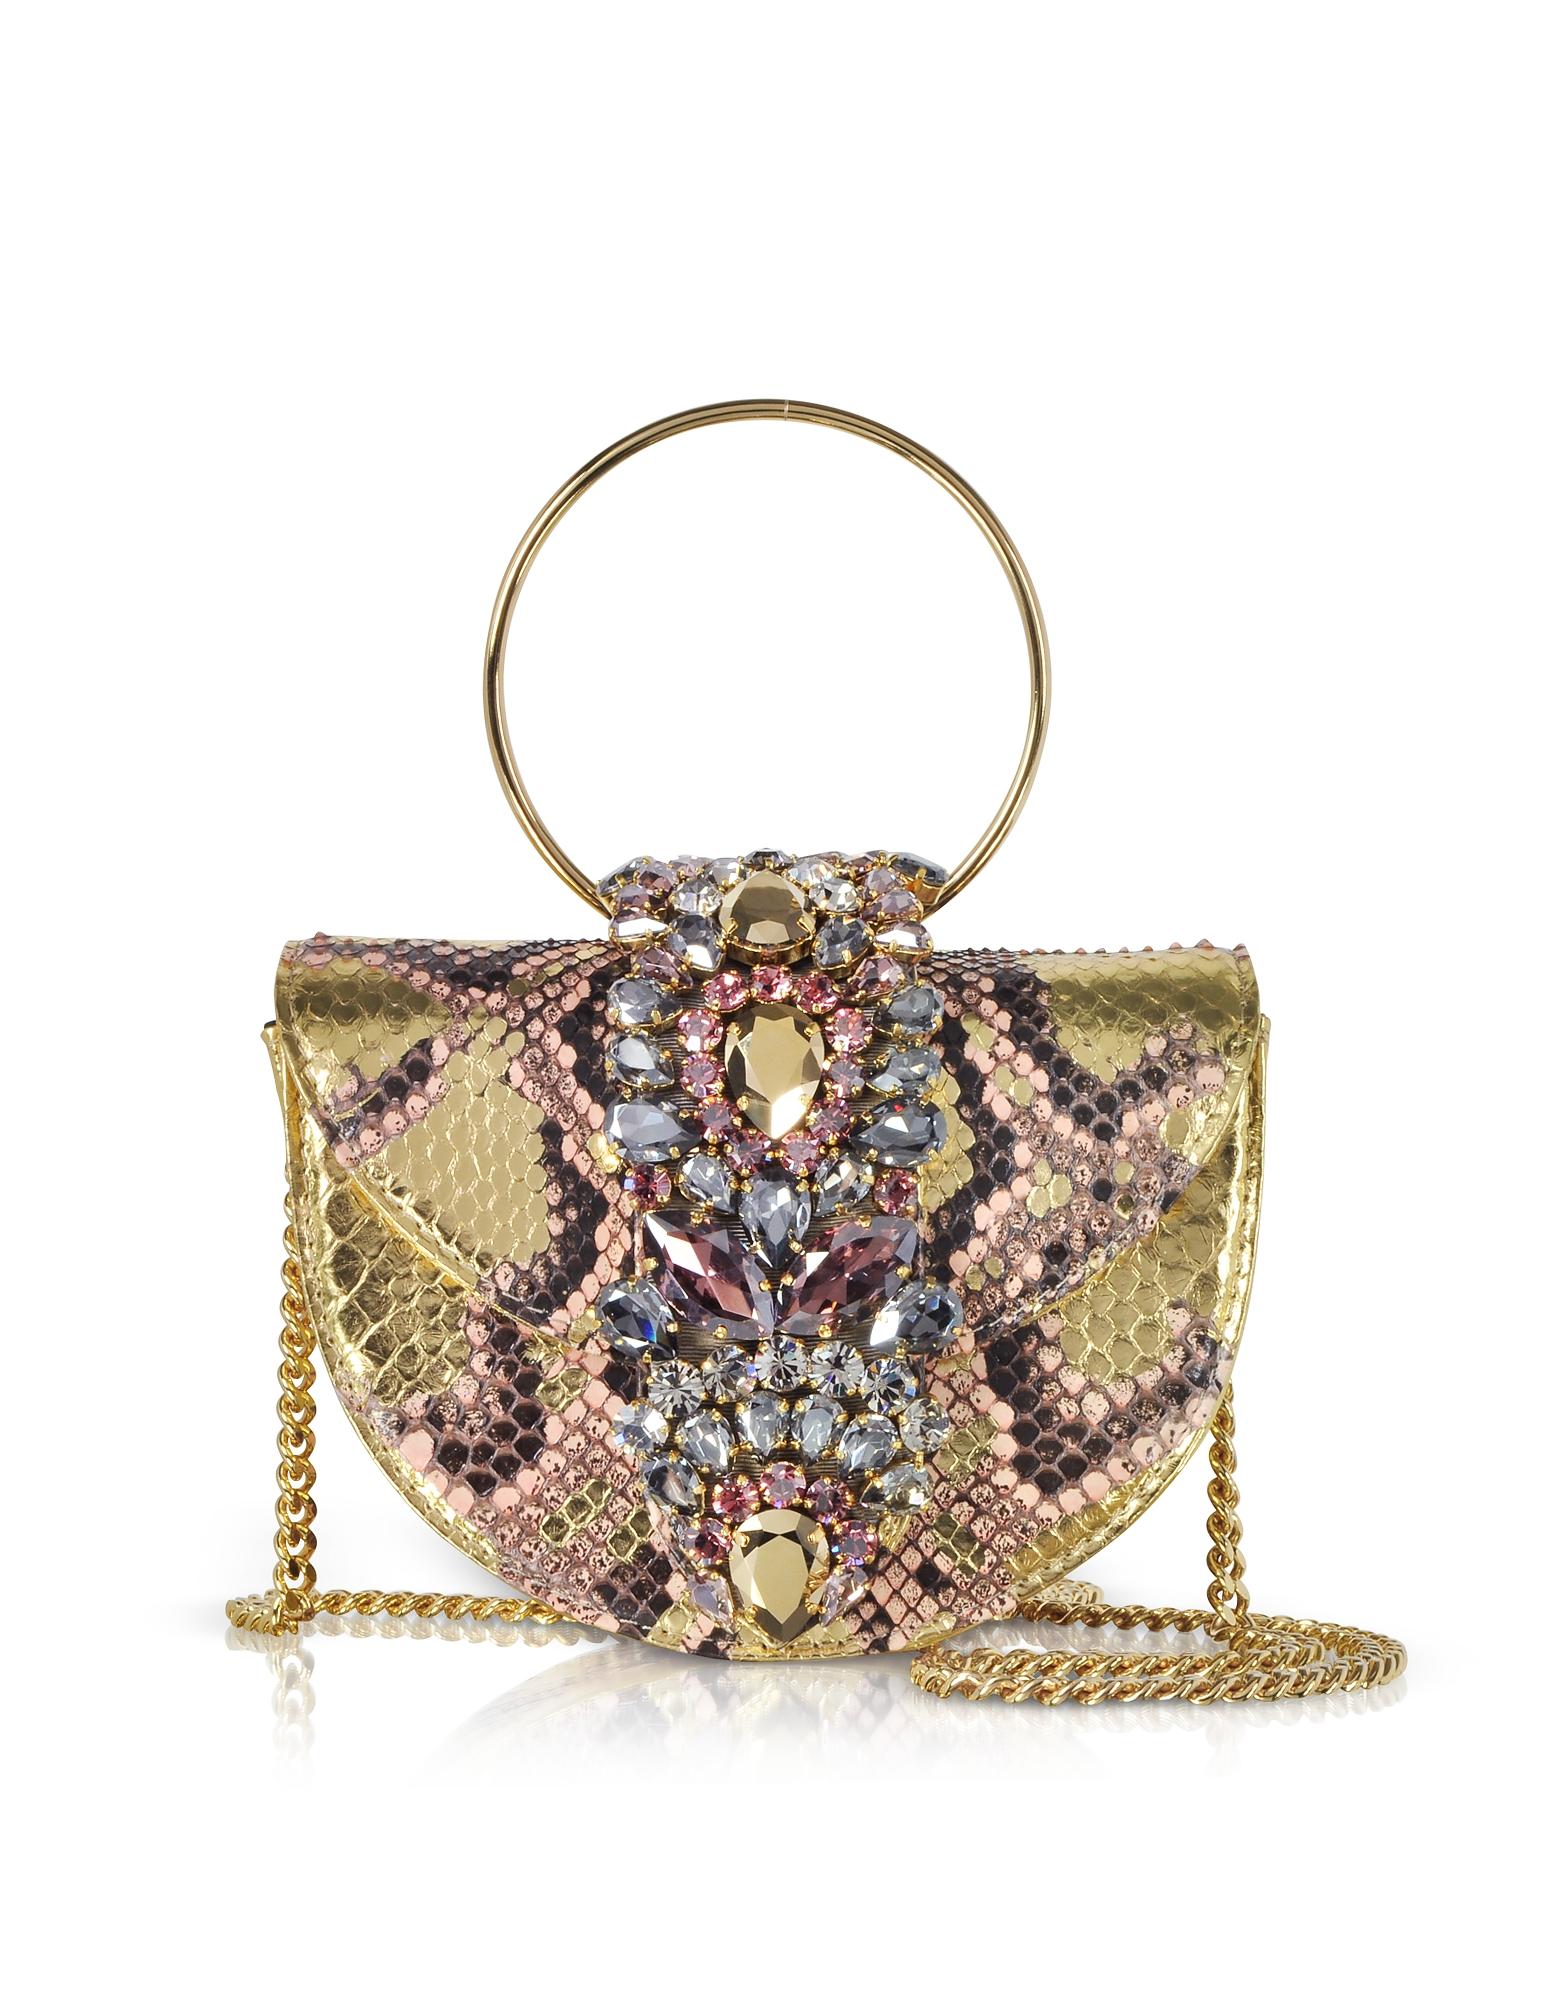 Mini Brigitte Pink Gold Python Clutch w/Crystals and Chain Strap